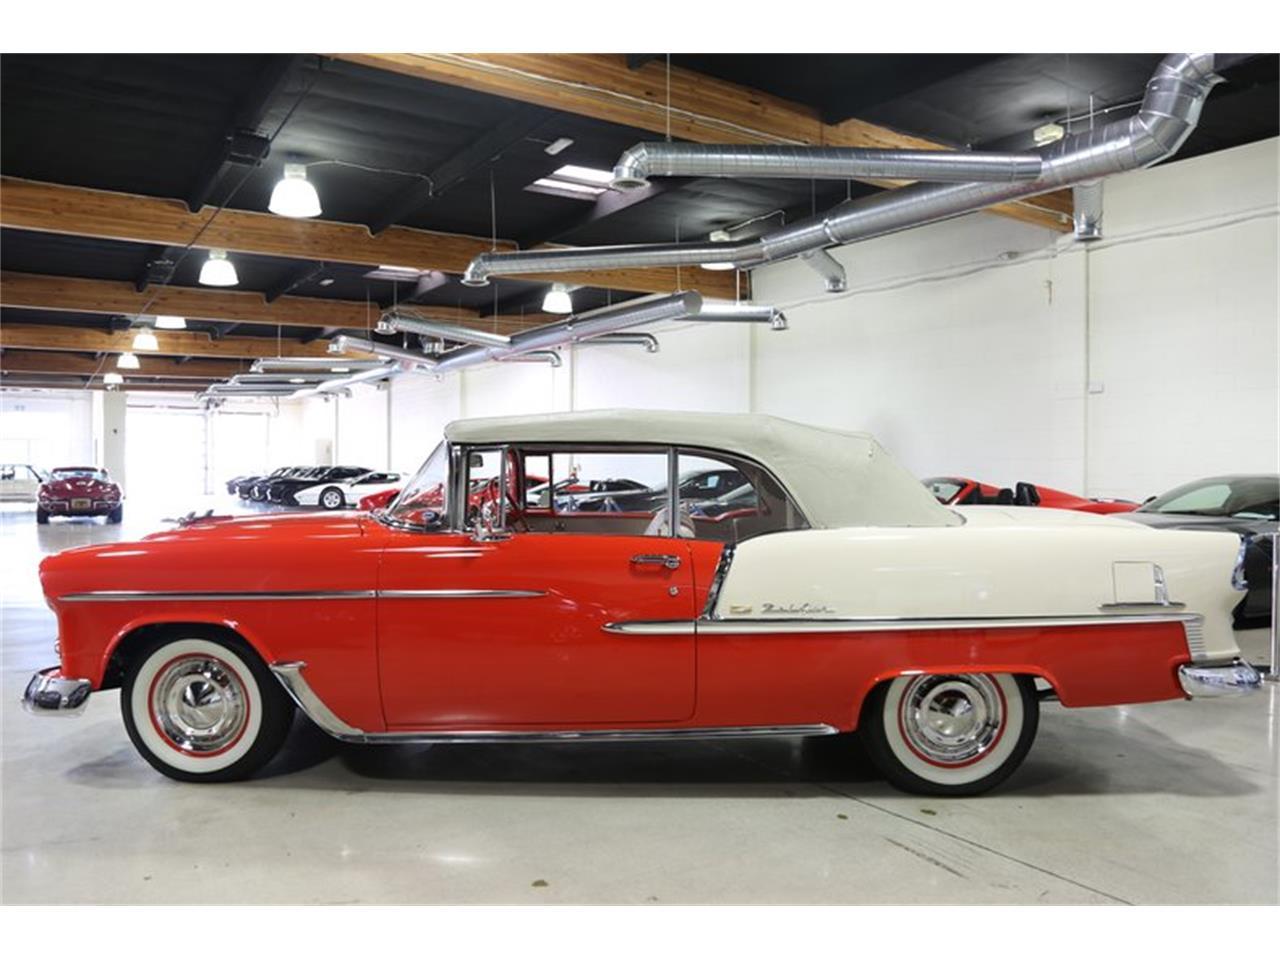 Large Picture of Classic '55 Chevrolet Bel Air located in California - $94,950.00 - QEQA